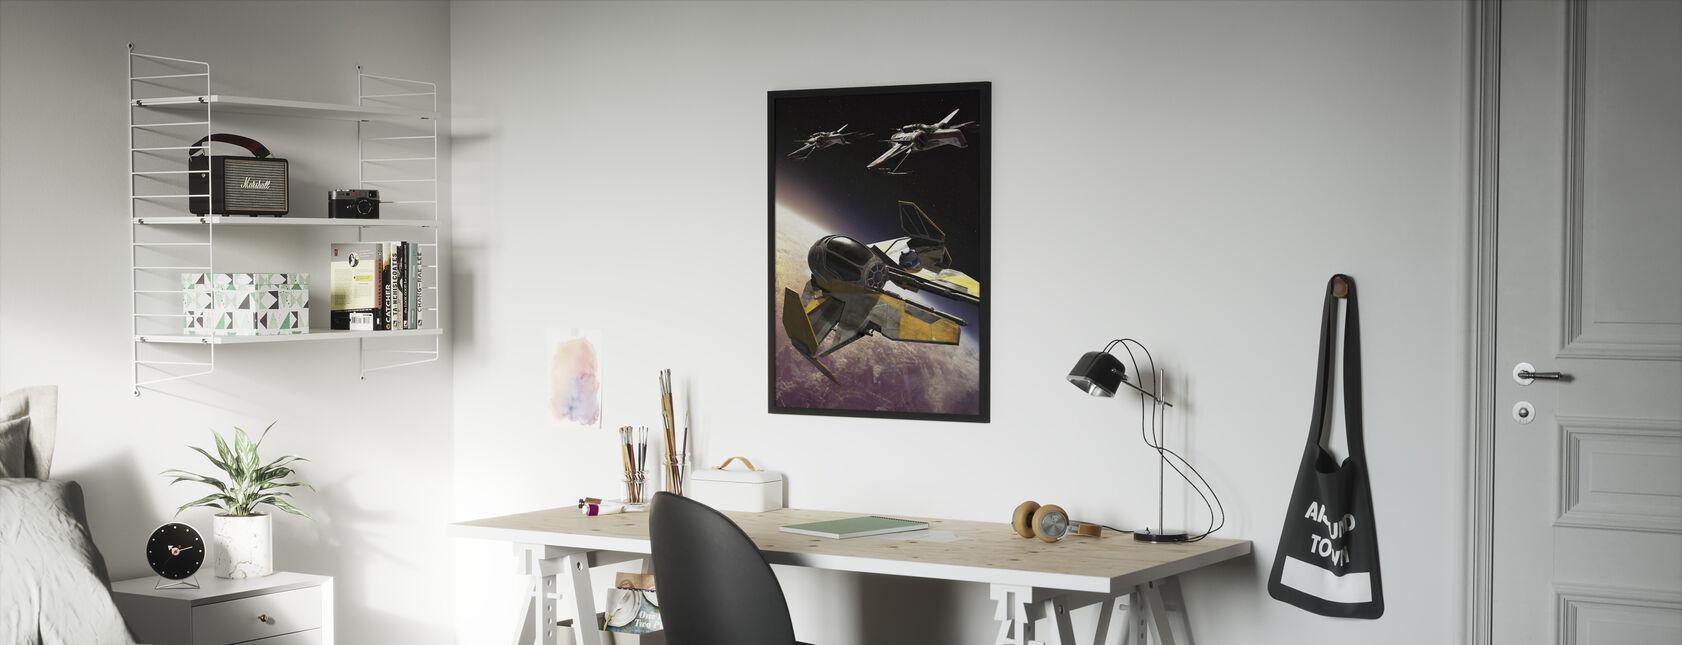 Star Wars - ARC-170 klone Starfighters - Innrammet bilde - Barnerom